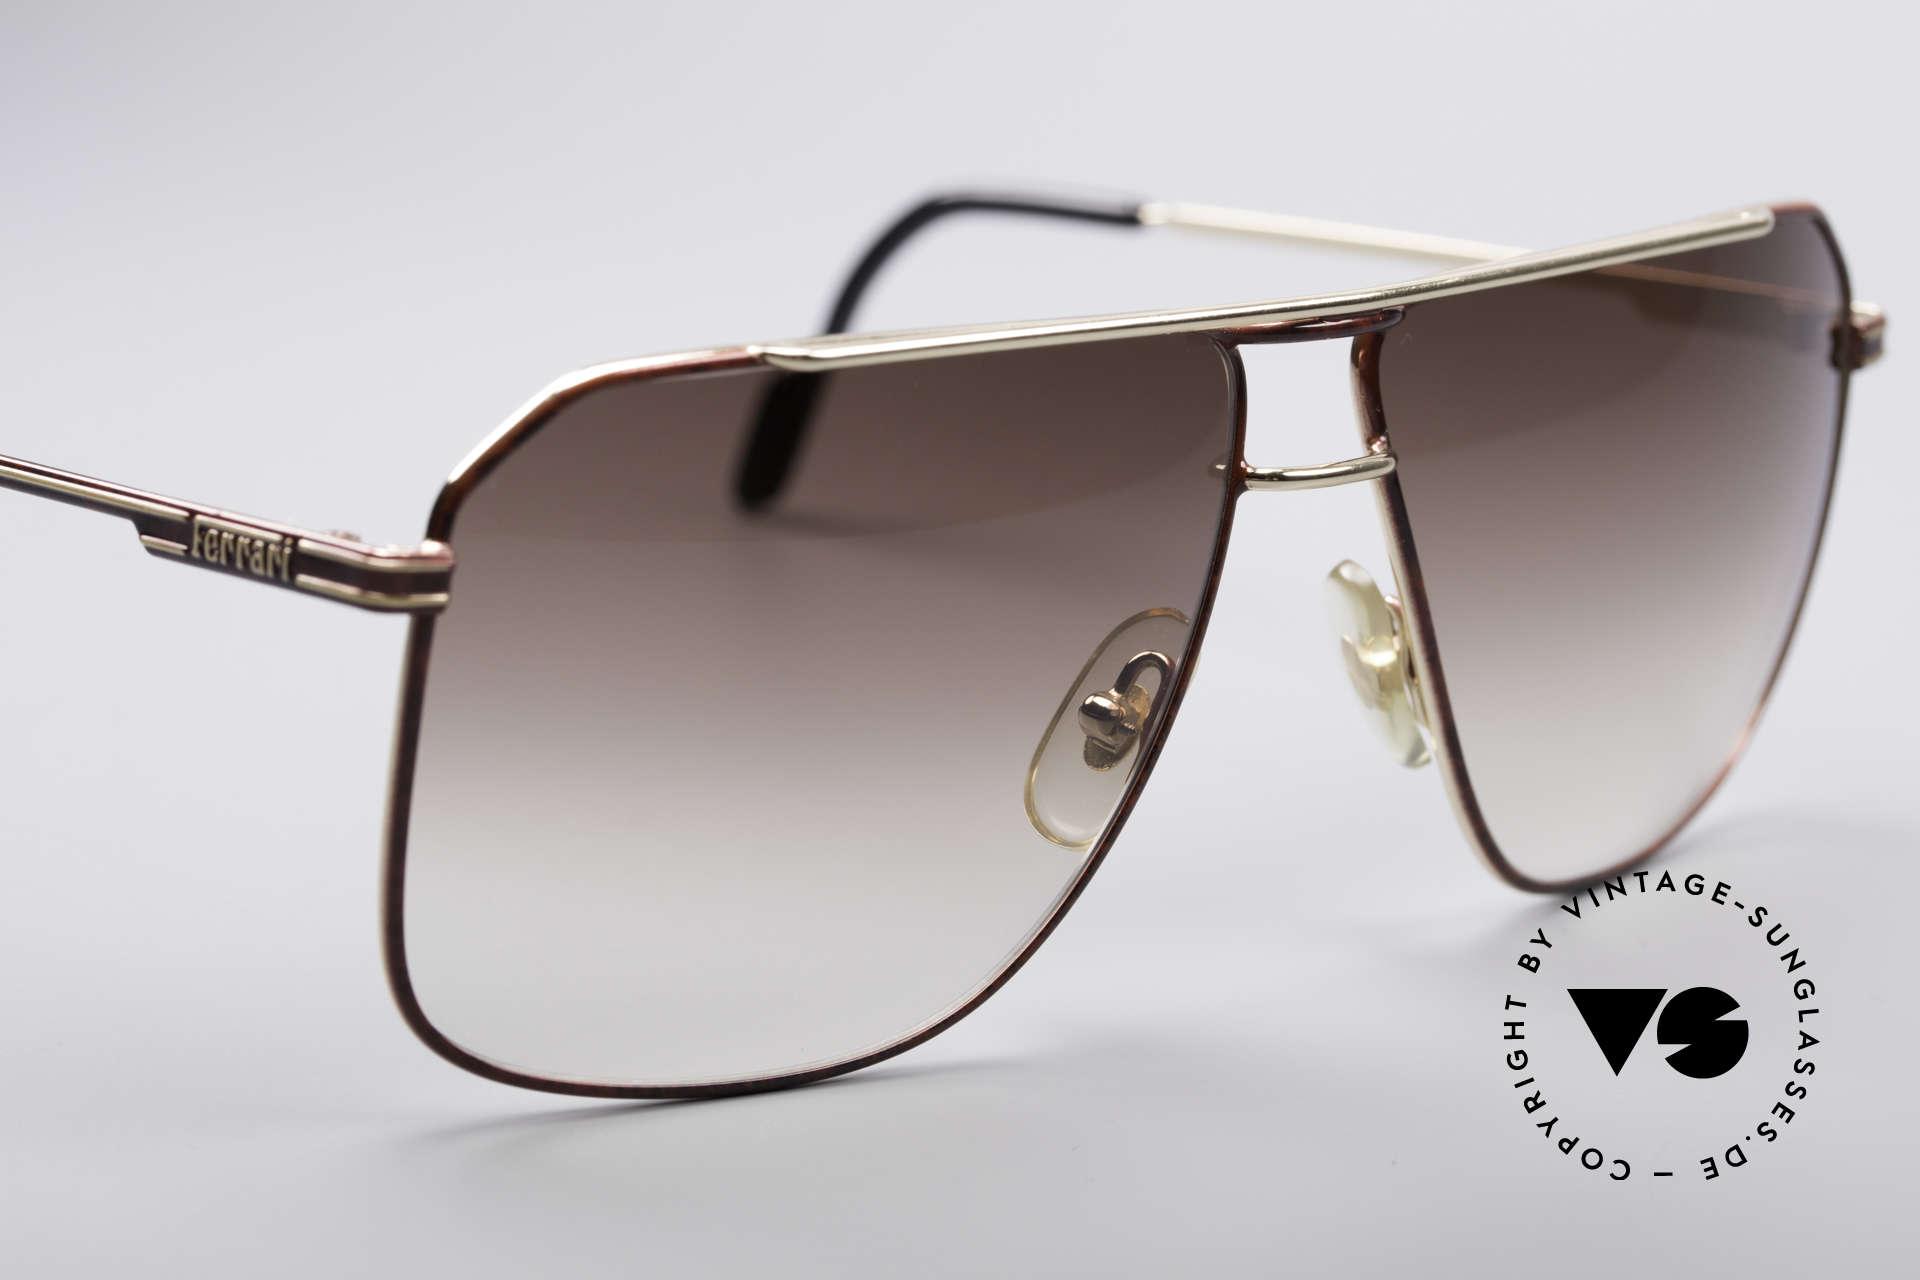 7349886bb7c Sunglasses Ferrari F24 80 s Men s Vintage Shades